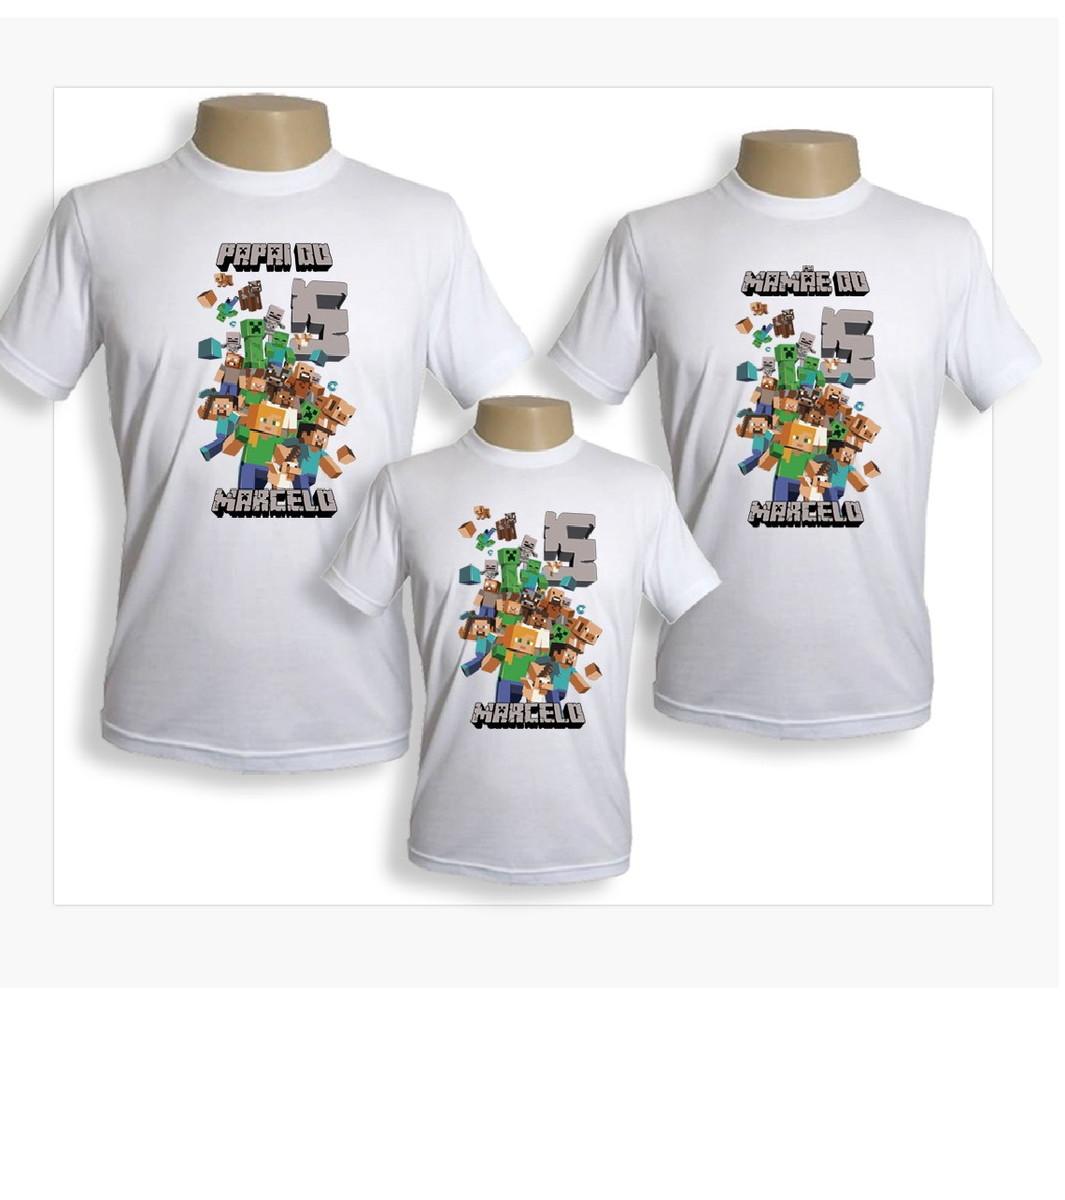 Camiseta Se Beber Case Moon Alan Não Giraffe No Elo7Sun ZwONnP80kX